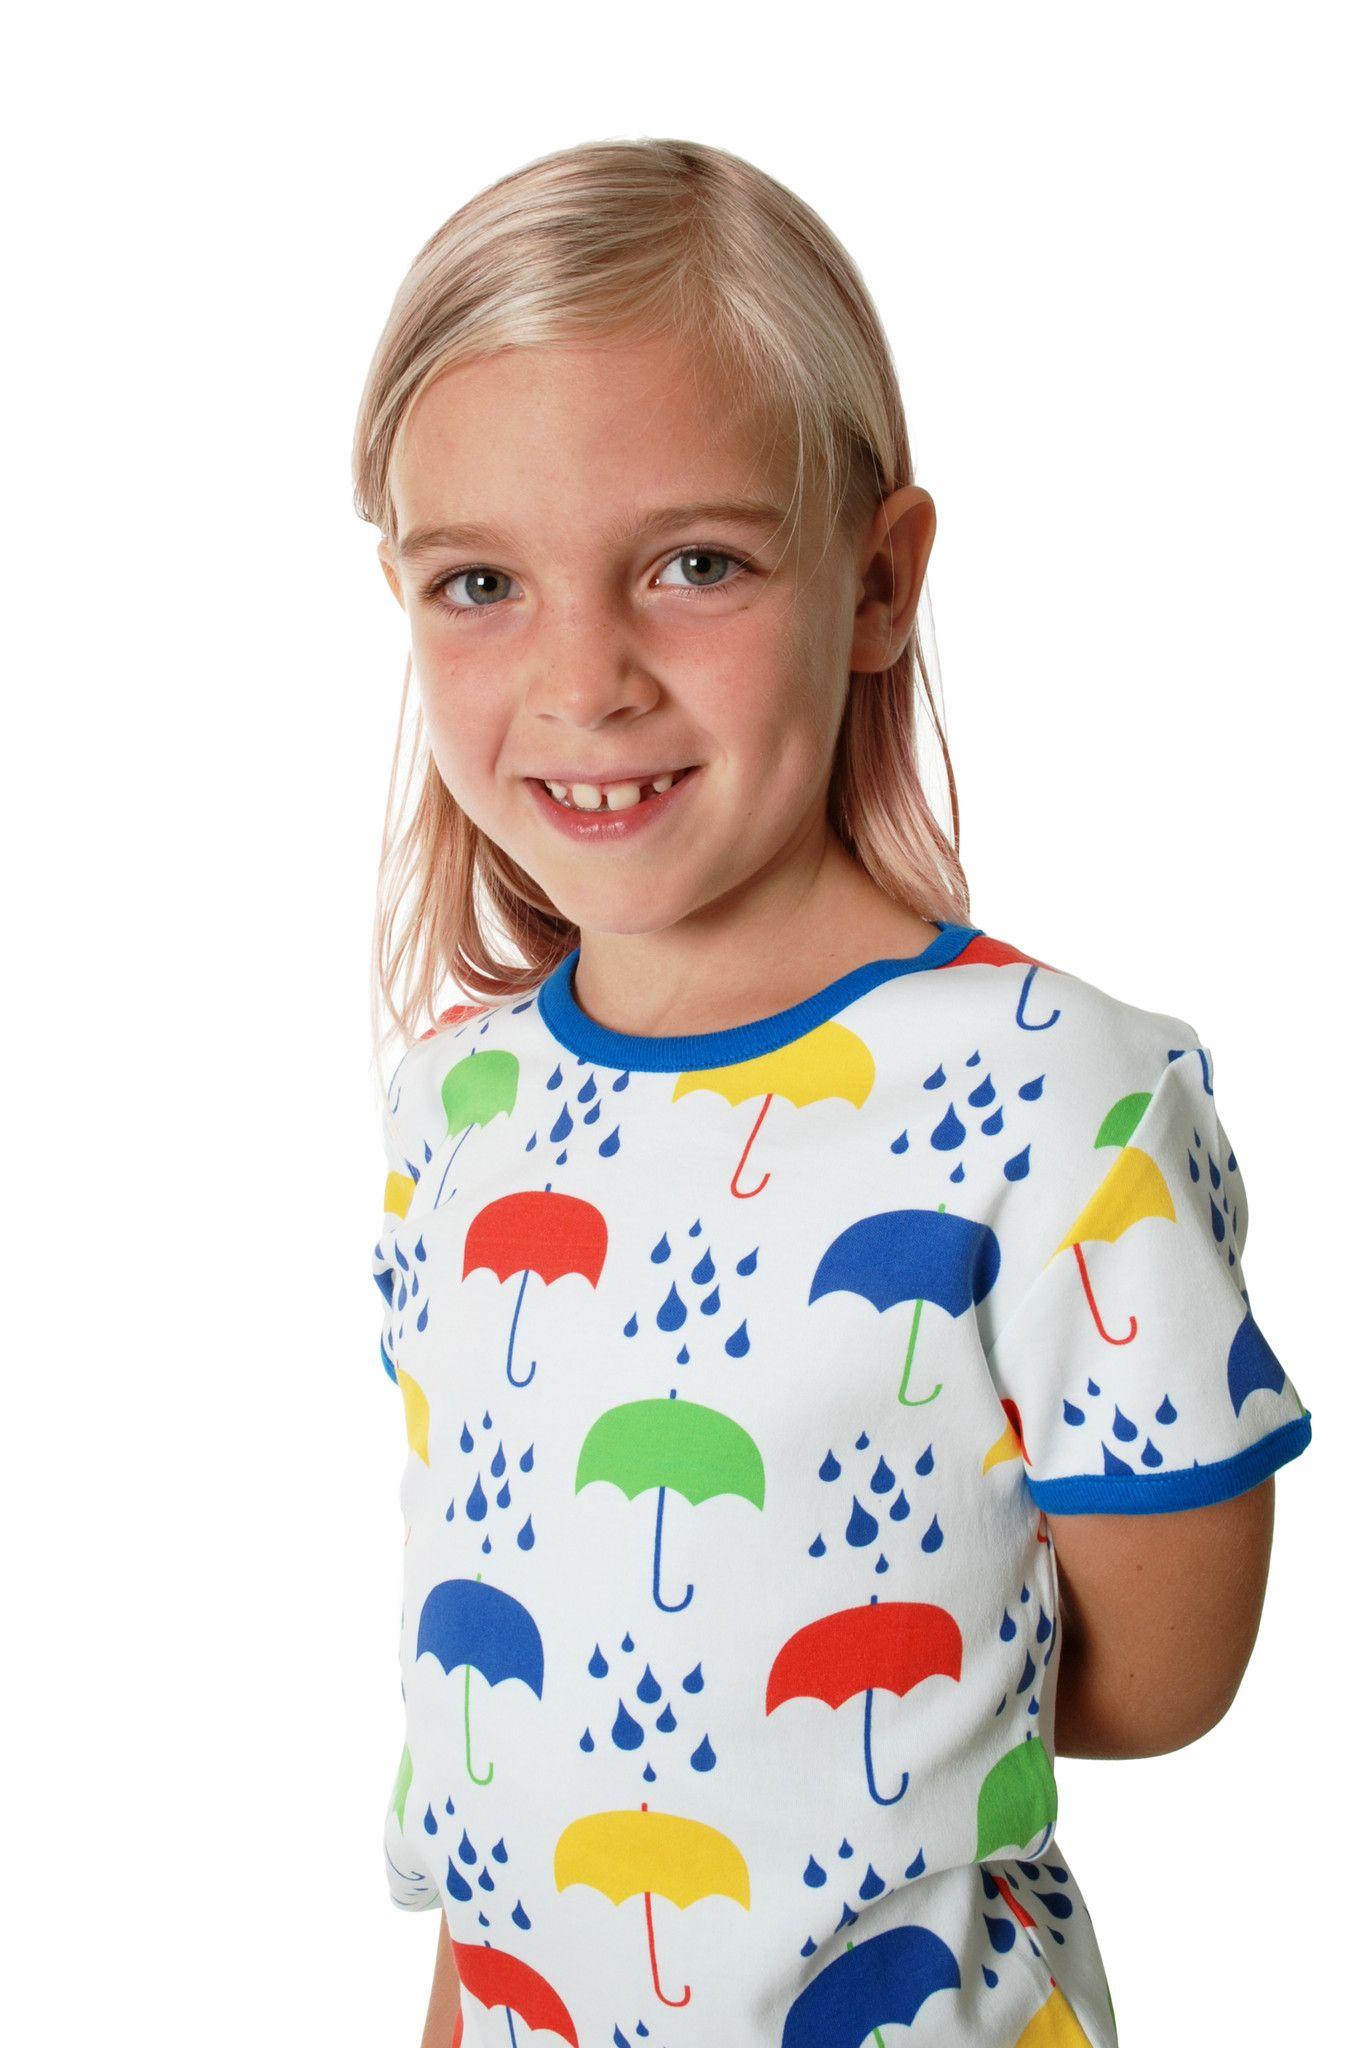 e8e585c5 White Umbrellas Organic Cotton Short Sleeve Shirt. From DUNS Sweden, offered  by Modern Rascals.